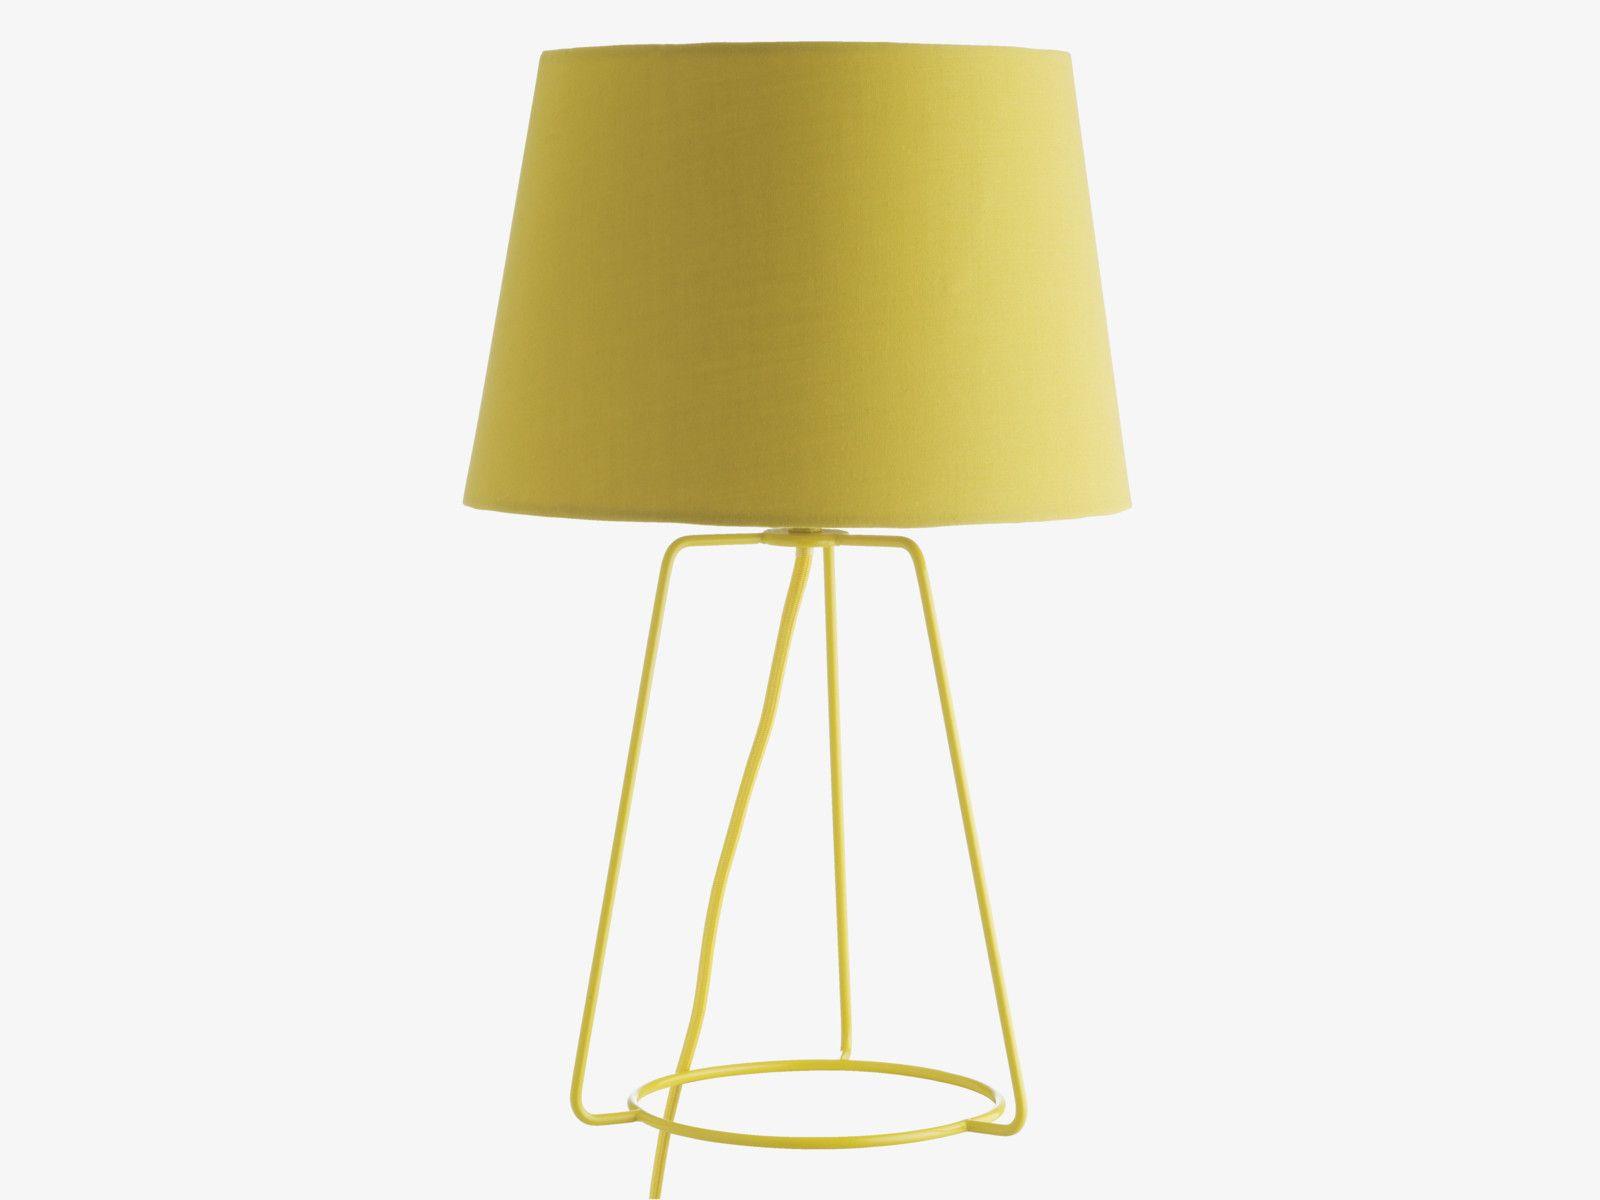 homebase table lamps bedside yellow